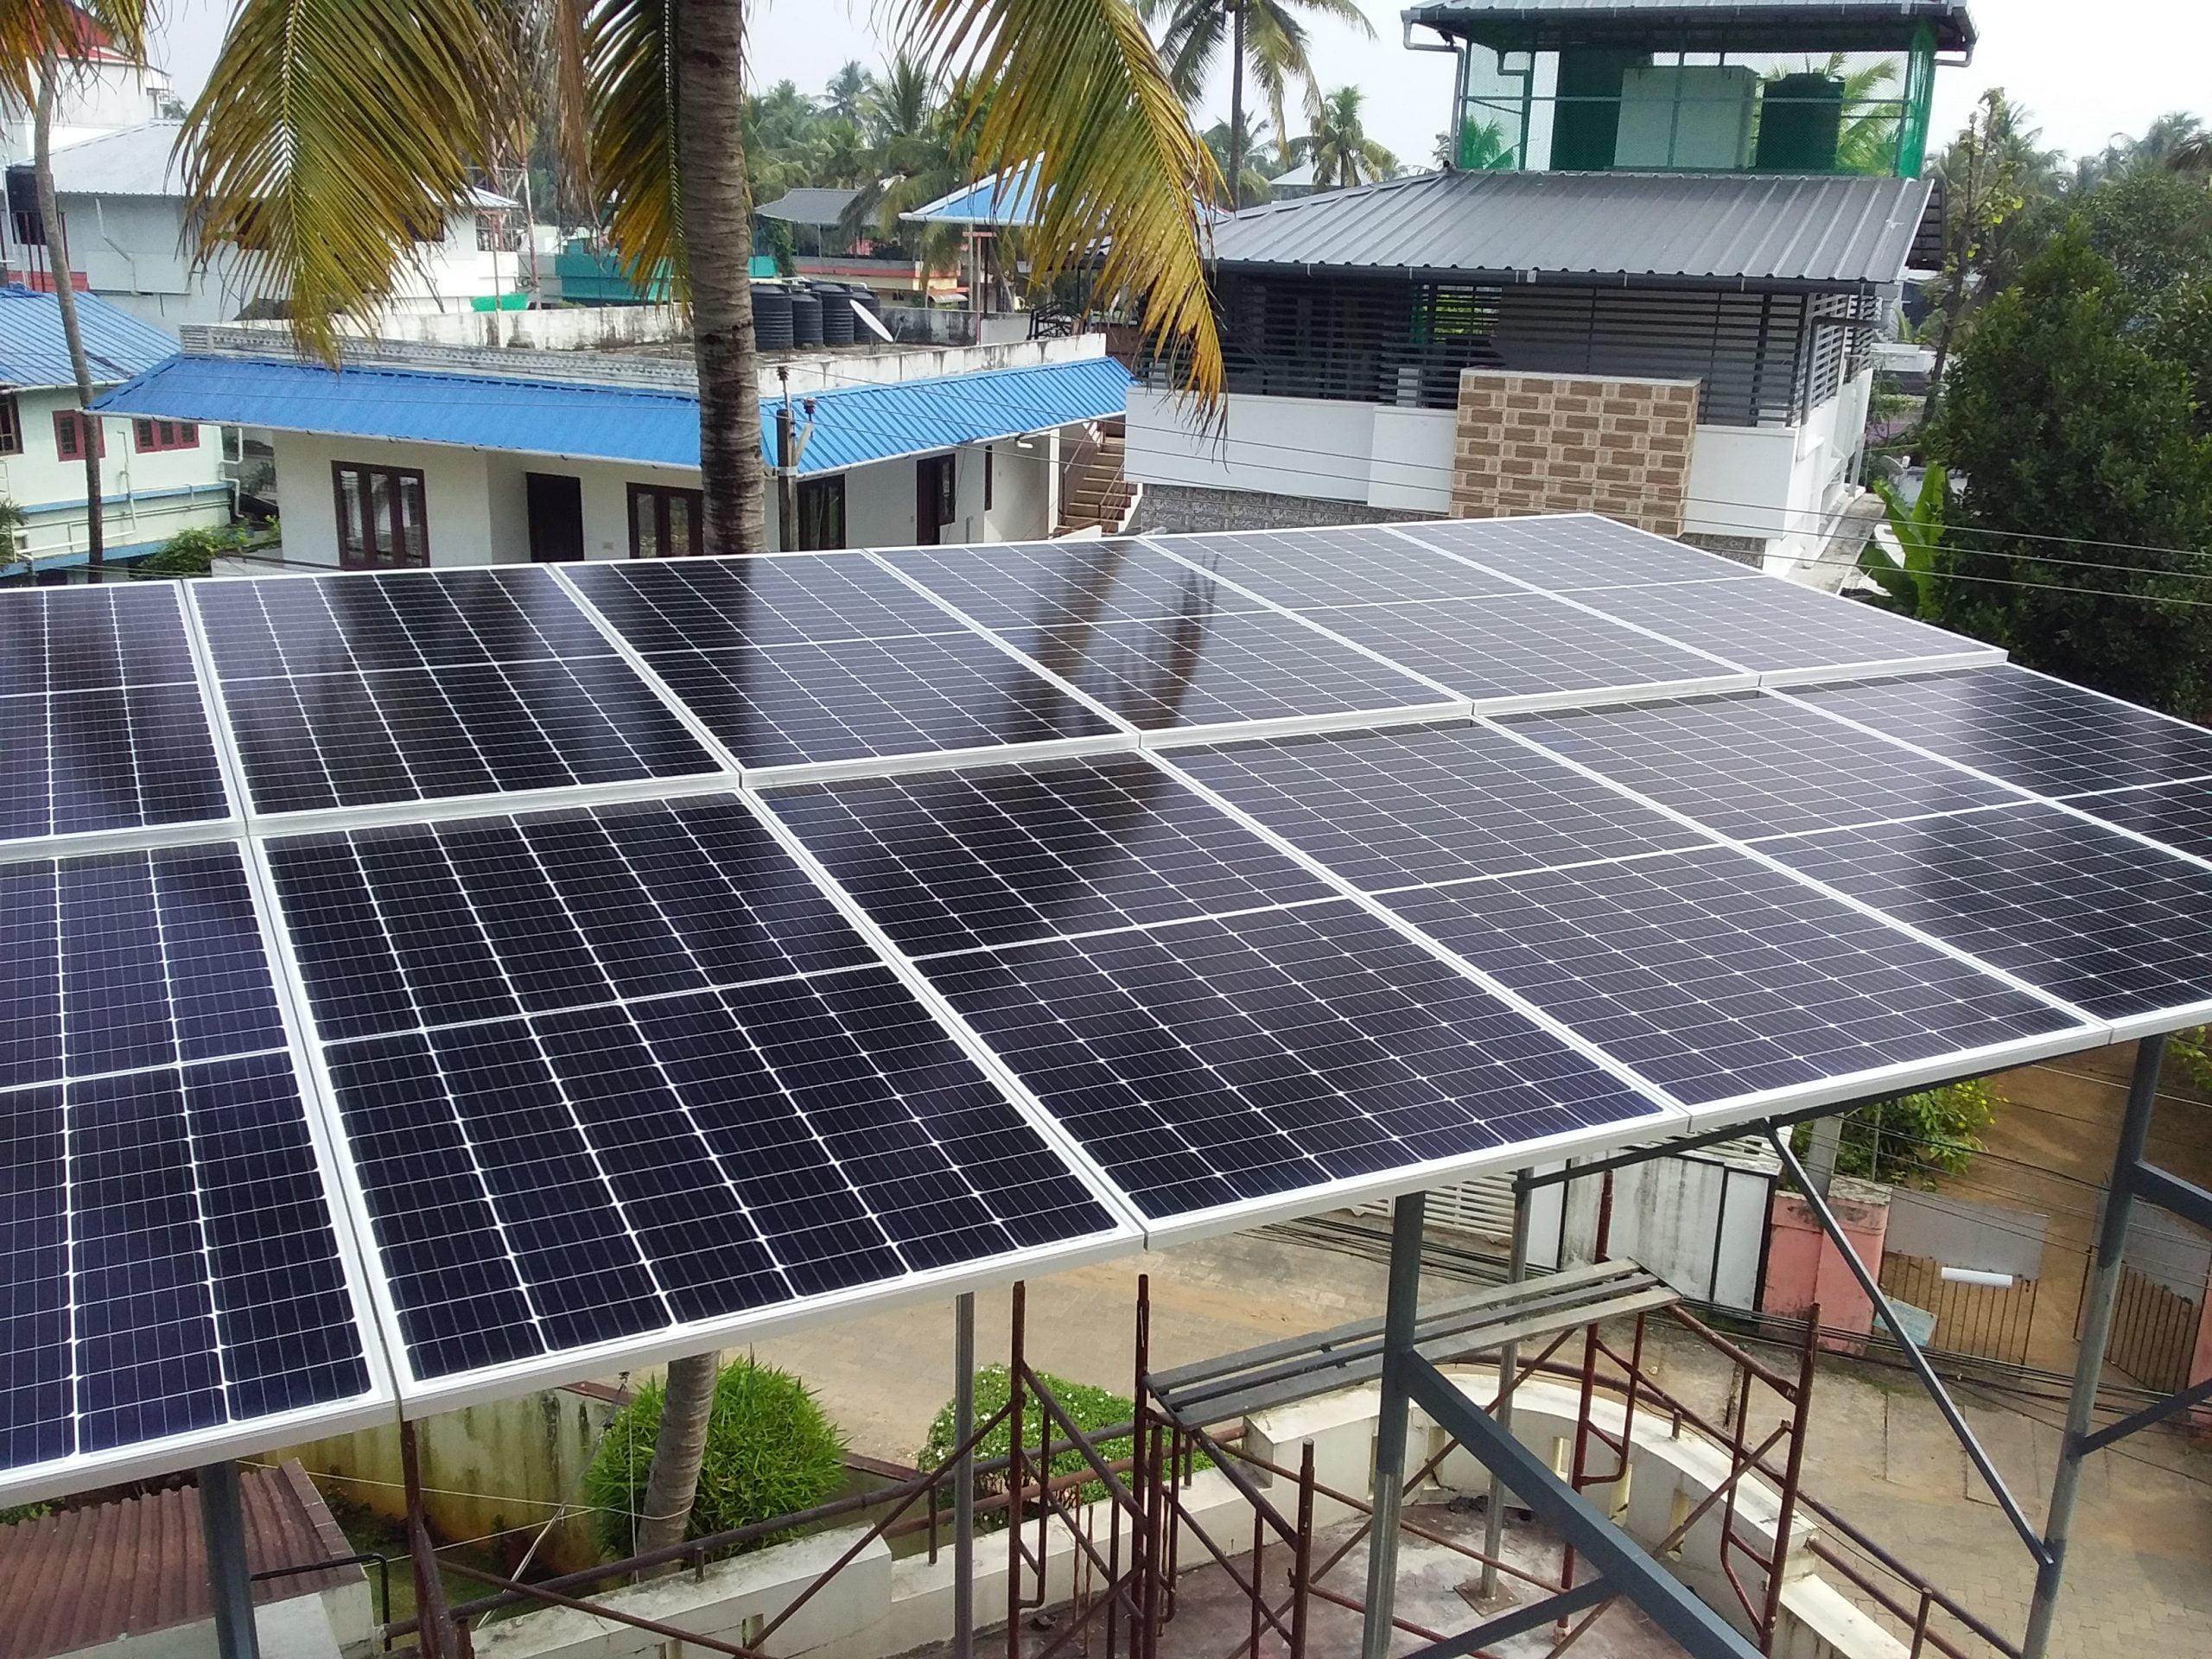 ABB UNO 5.0 solar ongrid inverter Longi Solar Panel Thykoodam ernakulam kerala